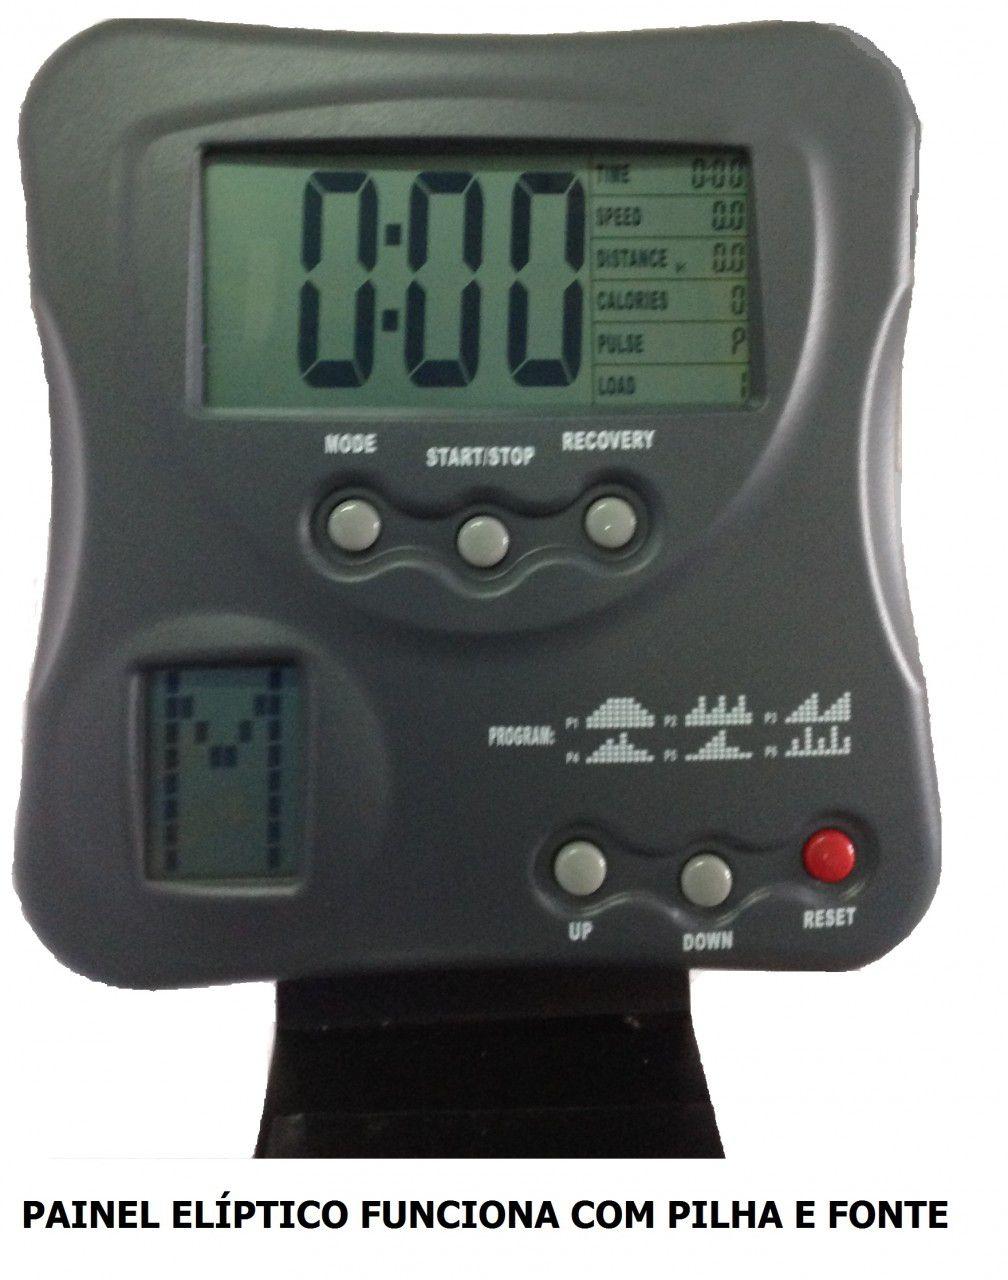 ELÍPTICO PROFISSIONAL TW 900  - Orluz